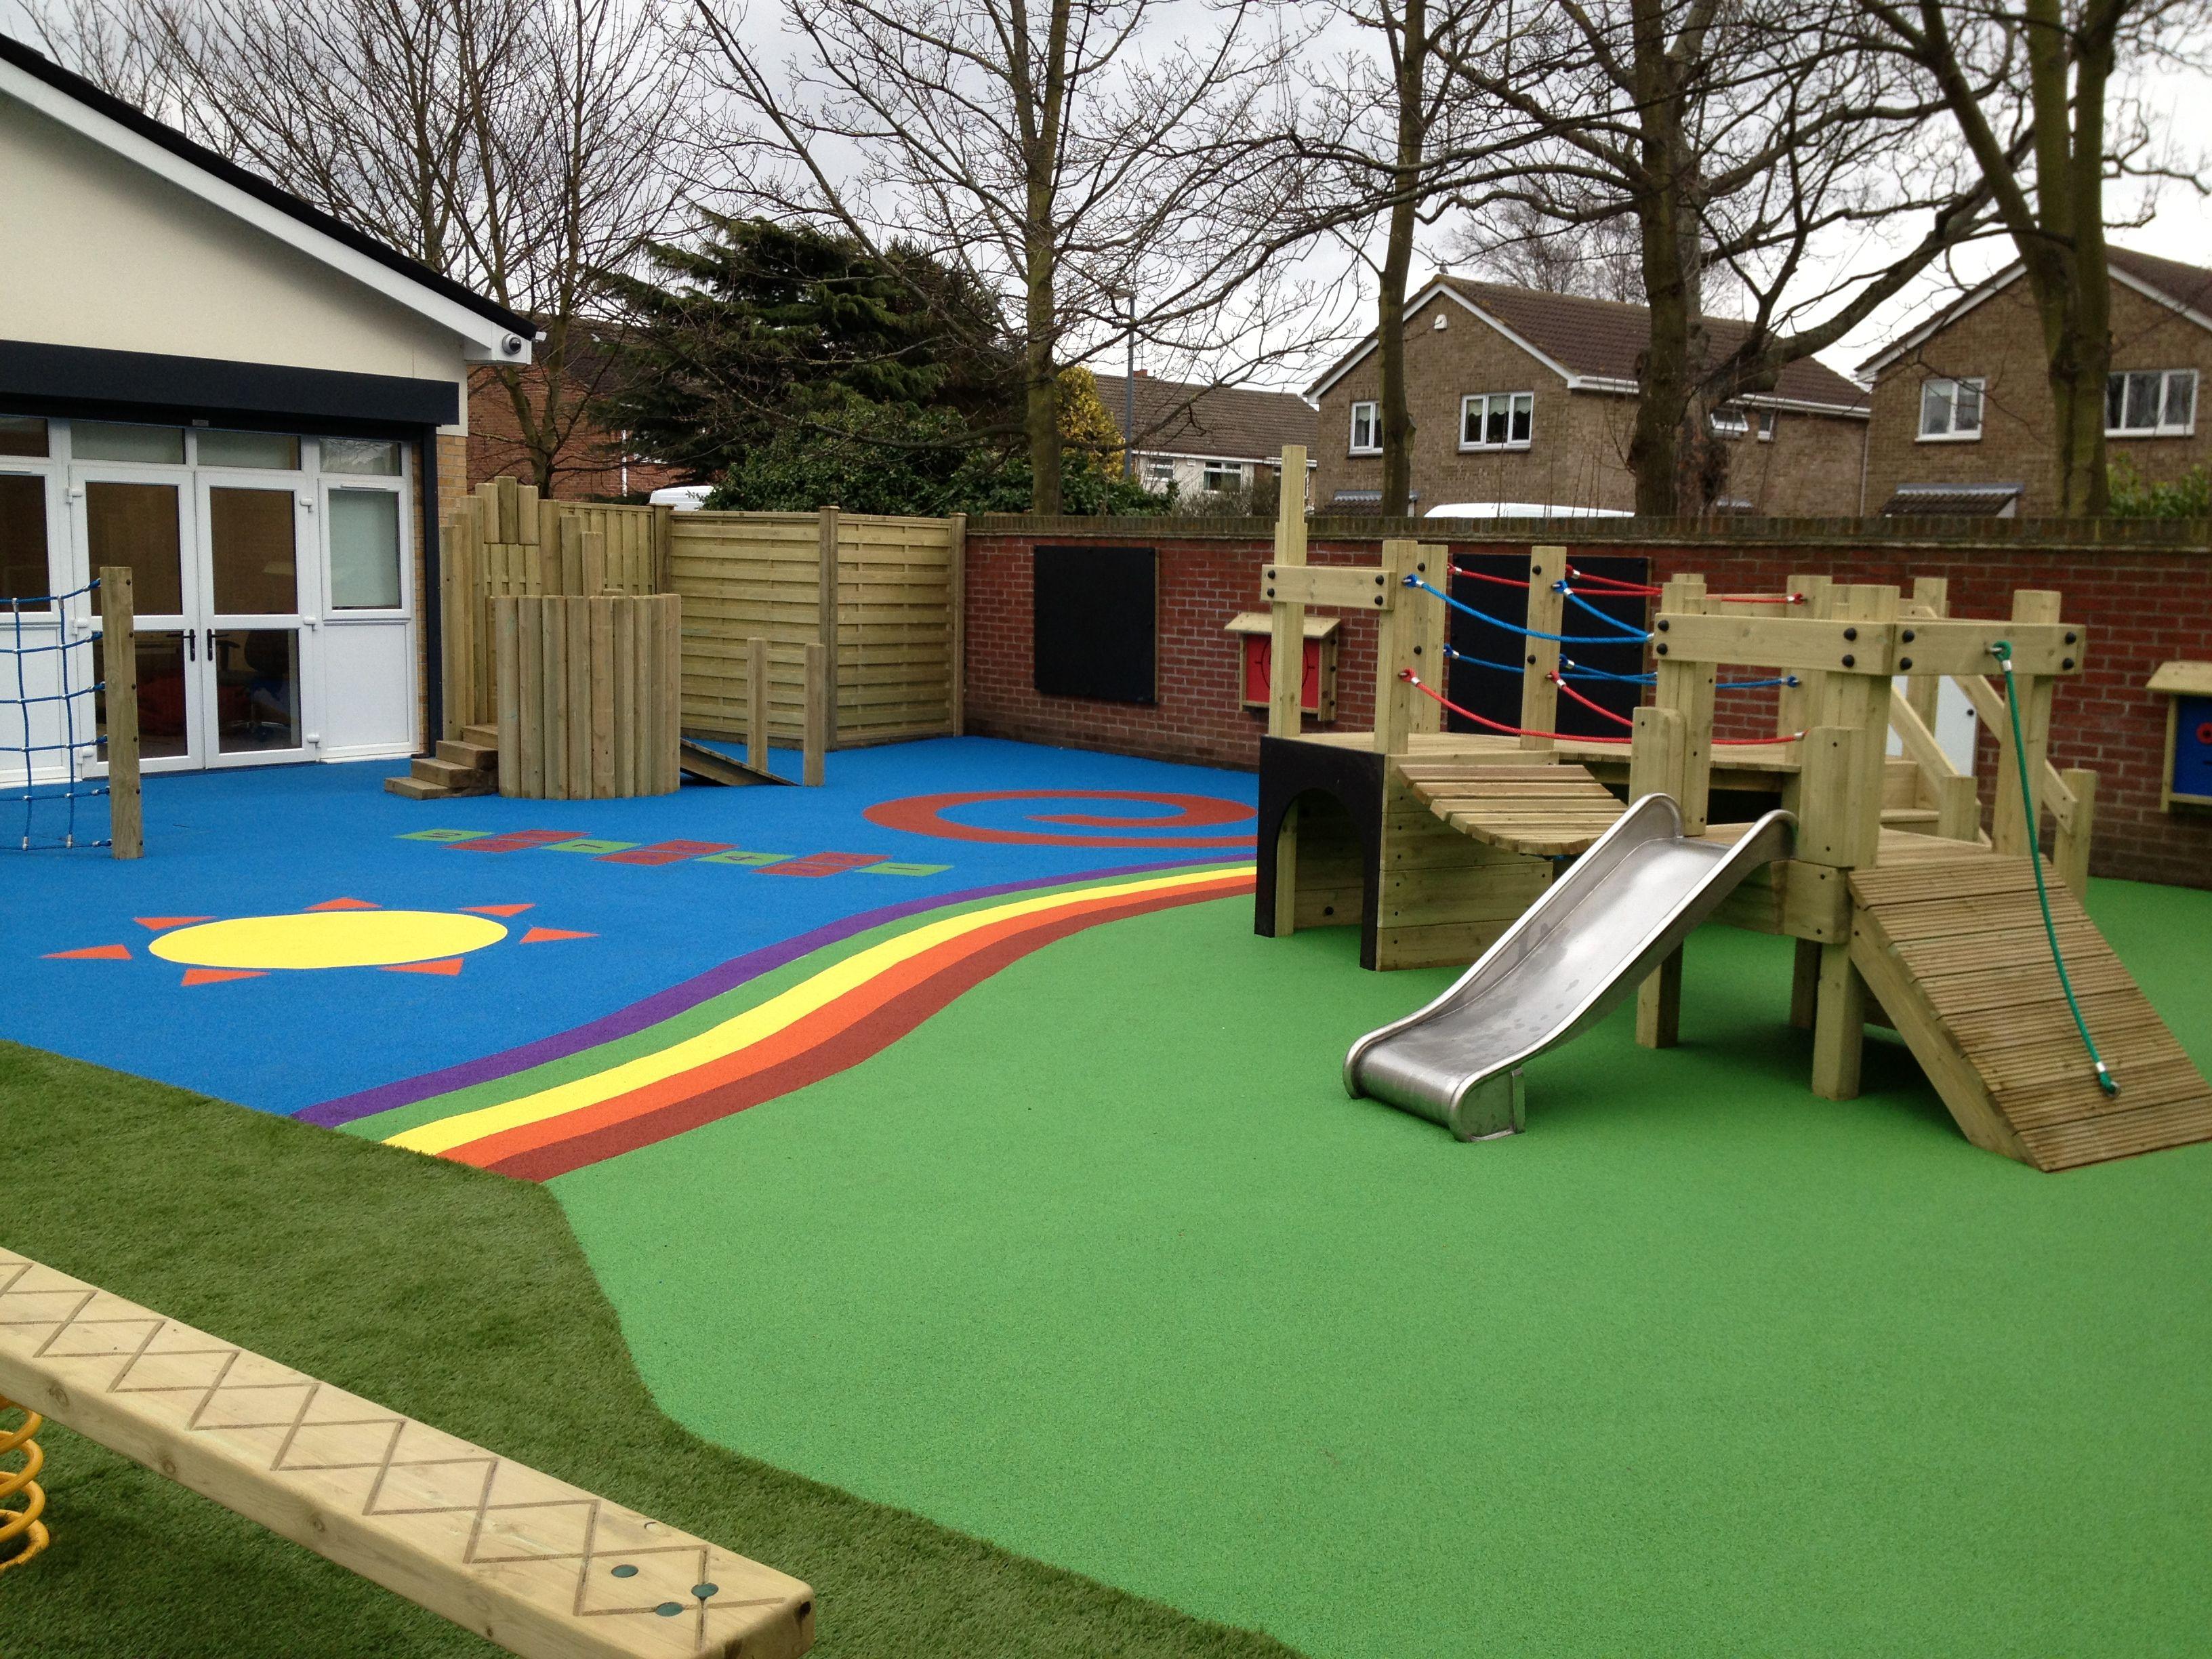 School playground equipment nursery school play for Garden design equipment